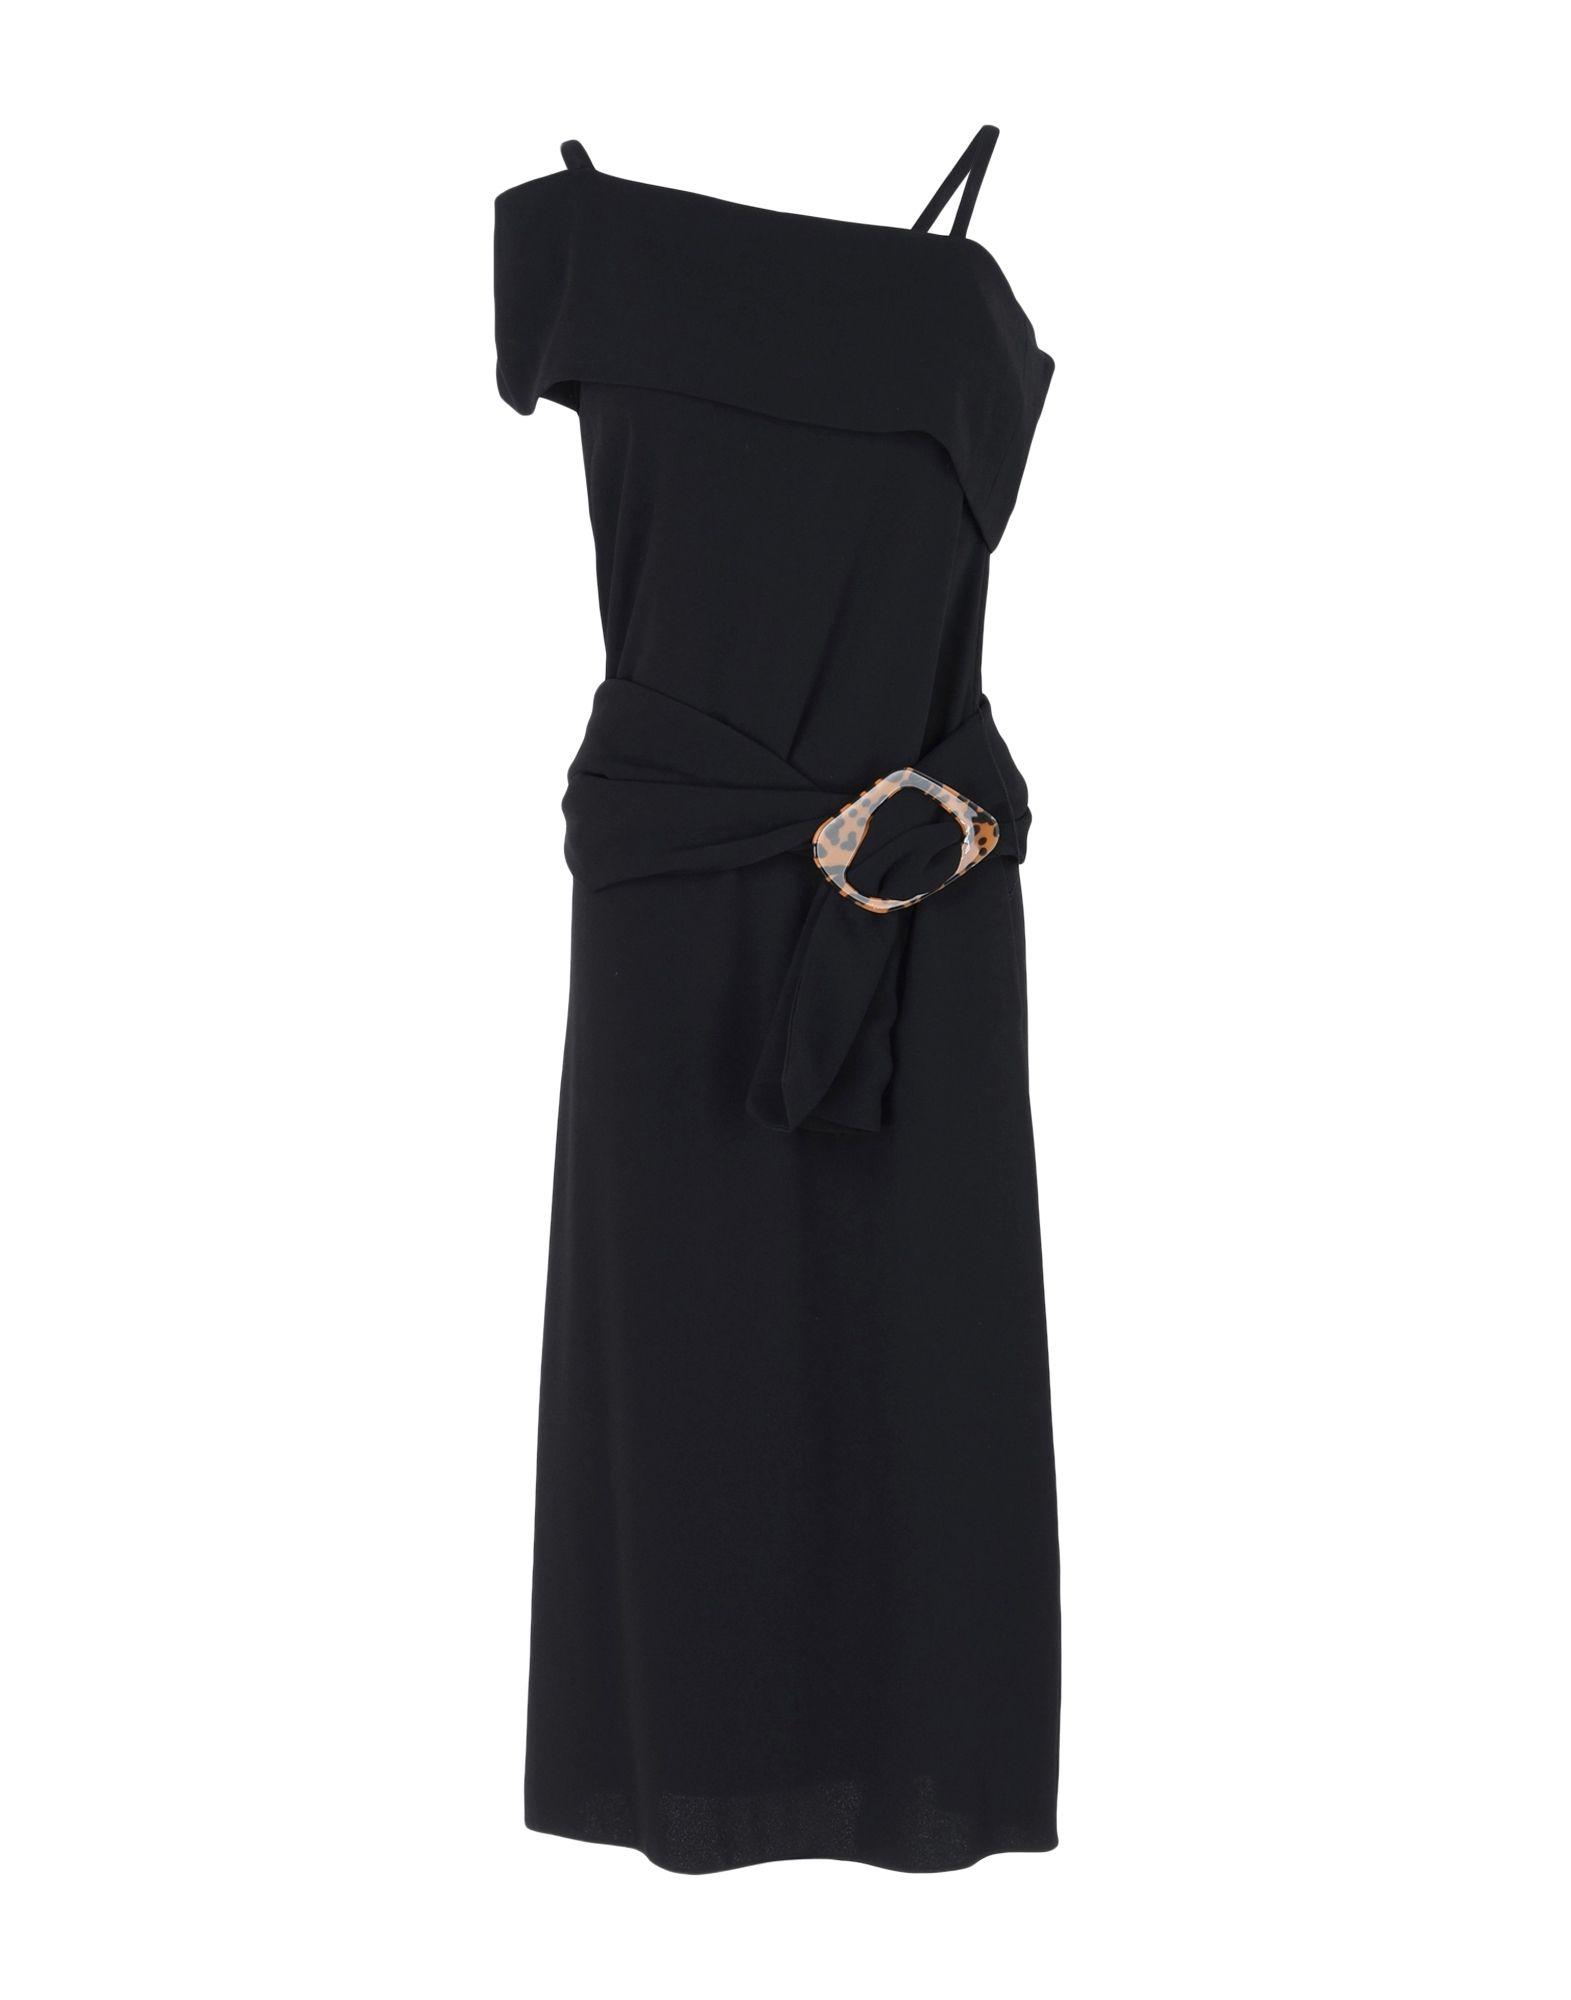 J.W.ANDERSON Платье длиной 3/4 lisa corti платье длиной 3 4